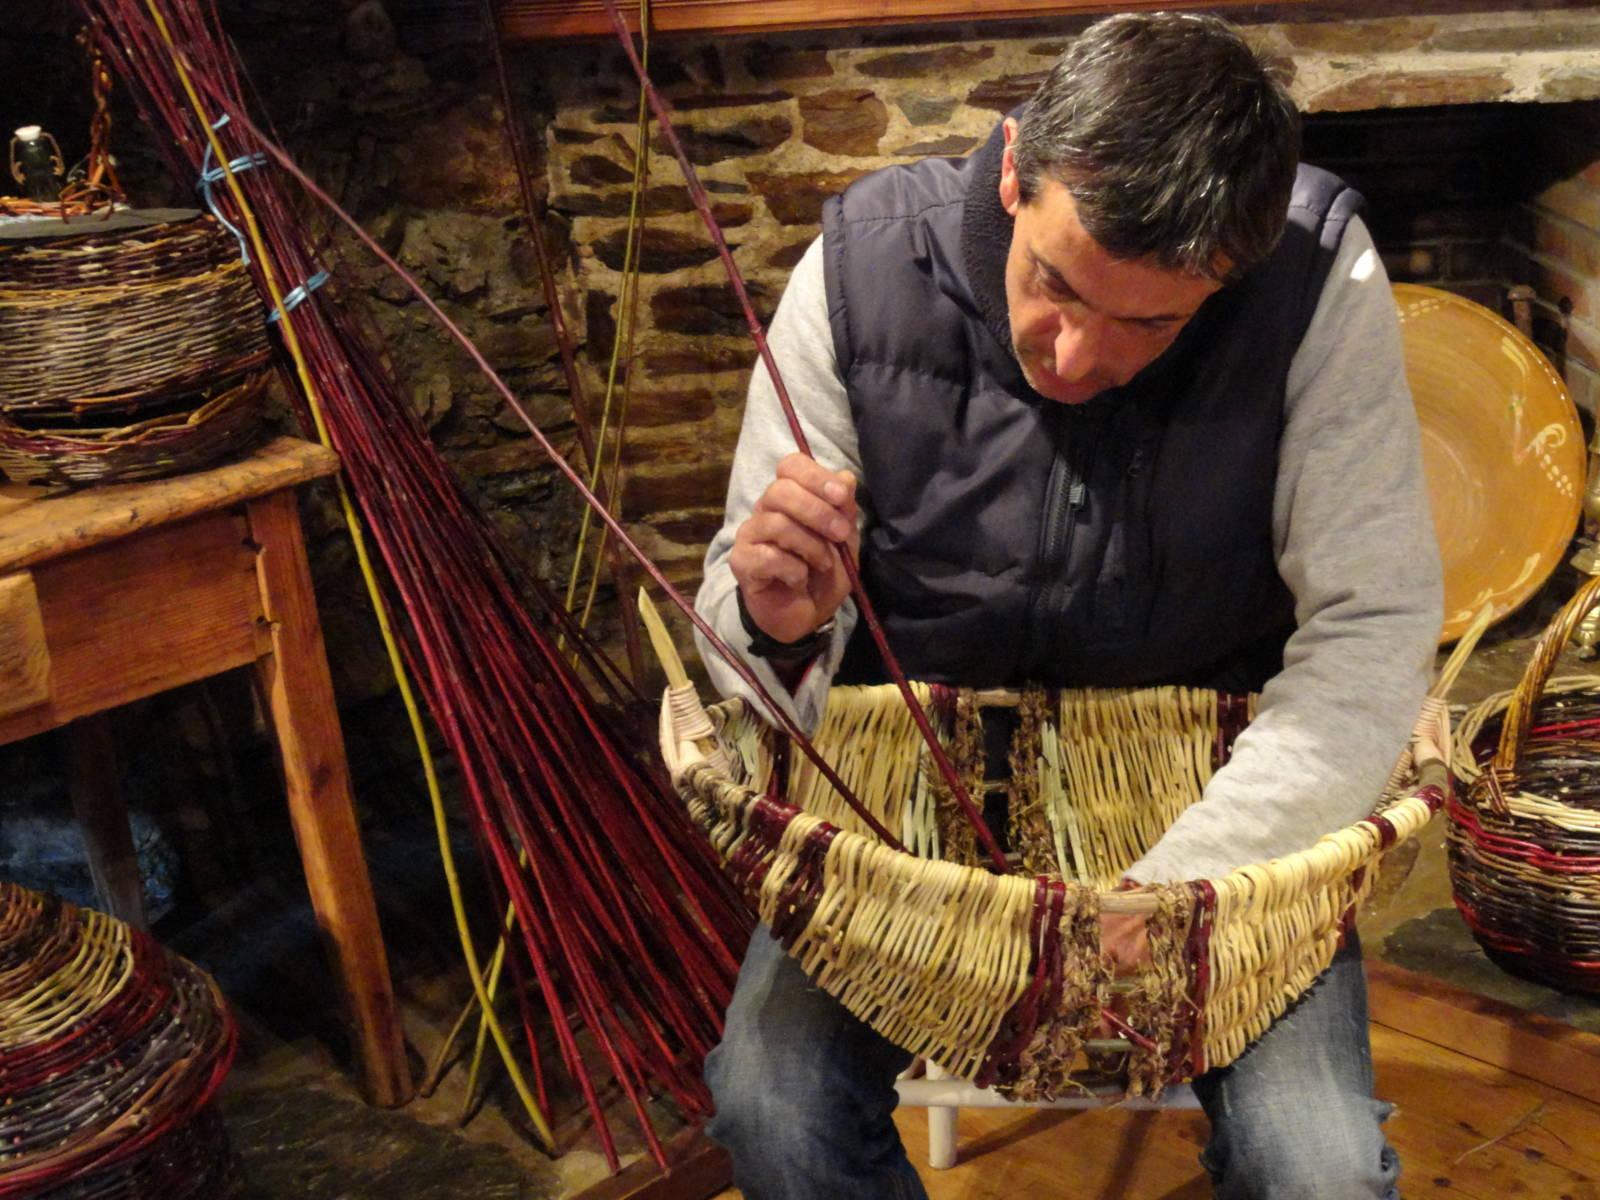 Traditionelles Kunsthandwerk aus dem Val d'Aran © Torisme Aran